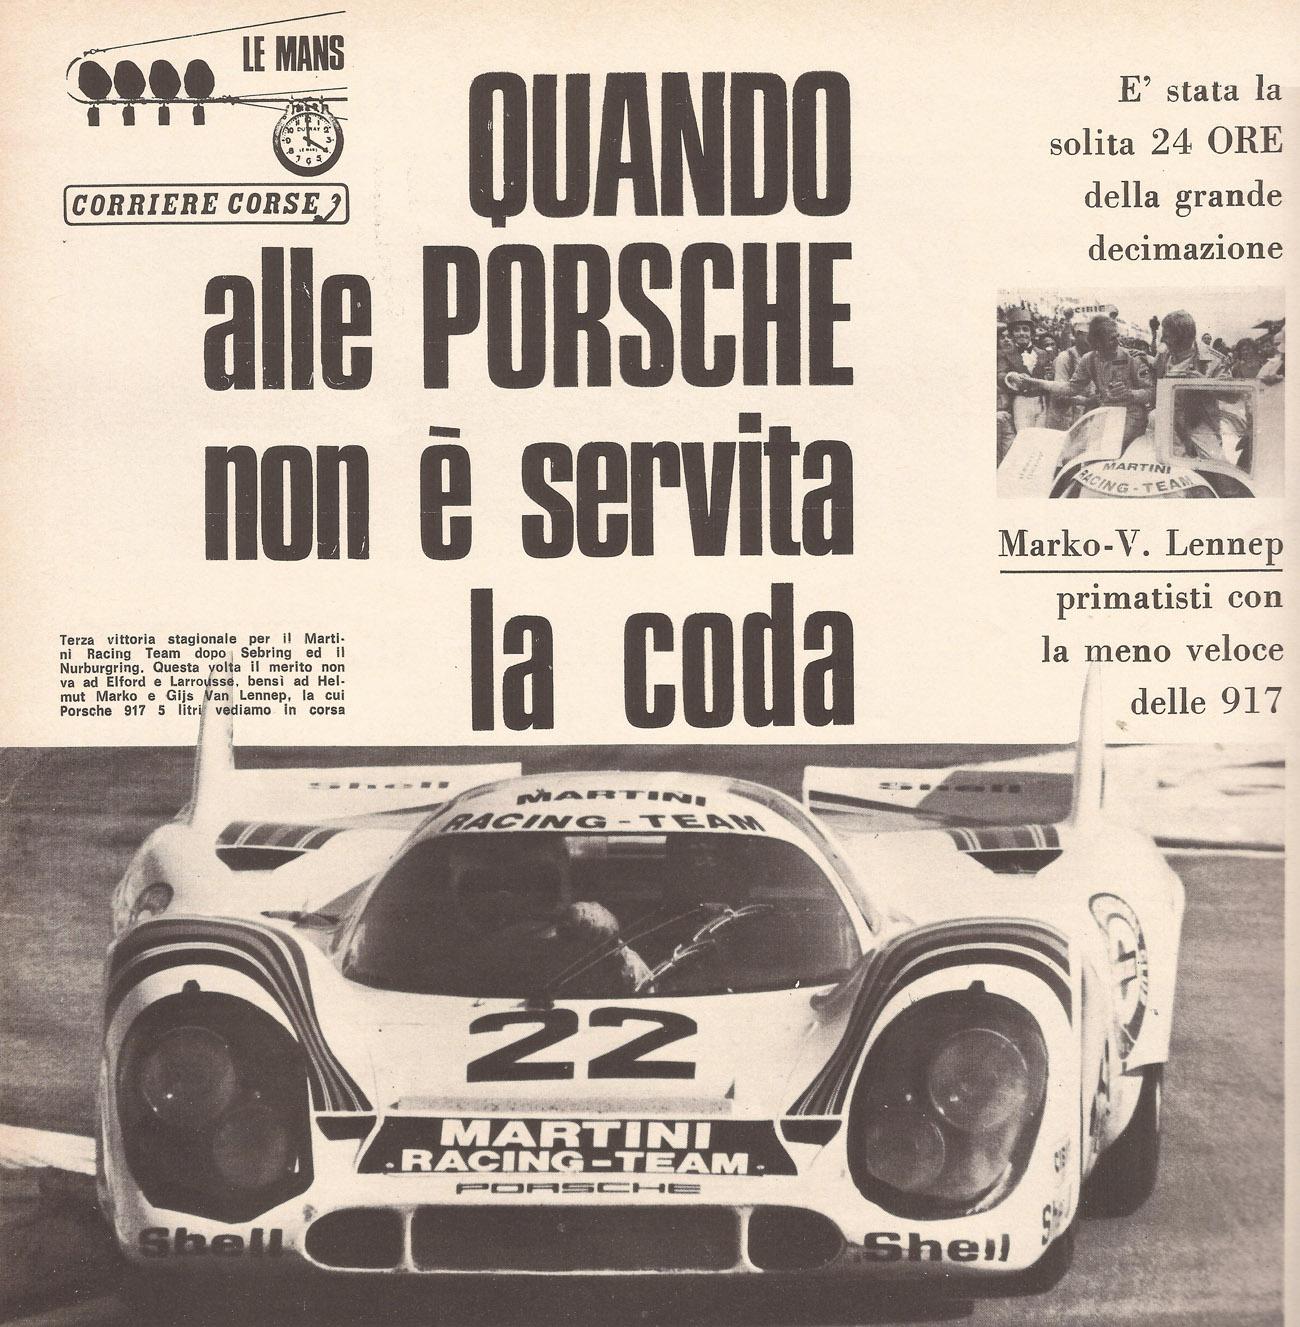 Pagina 22 di Autosprint 14-21 giugno 1971 - Page 22 of Autosprint 14-21 June 1971